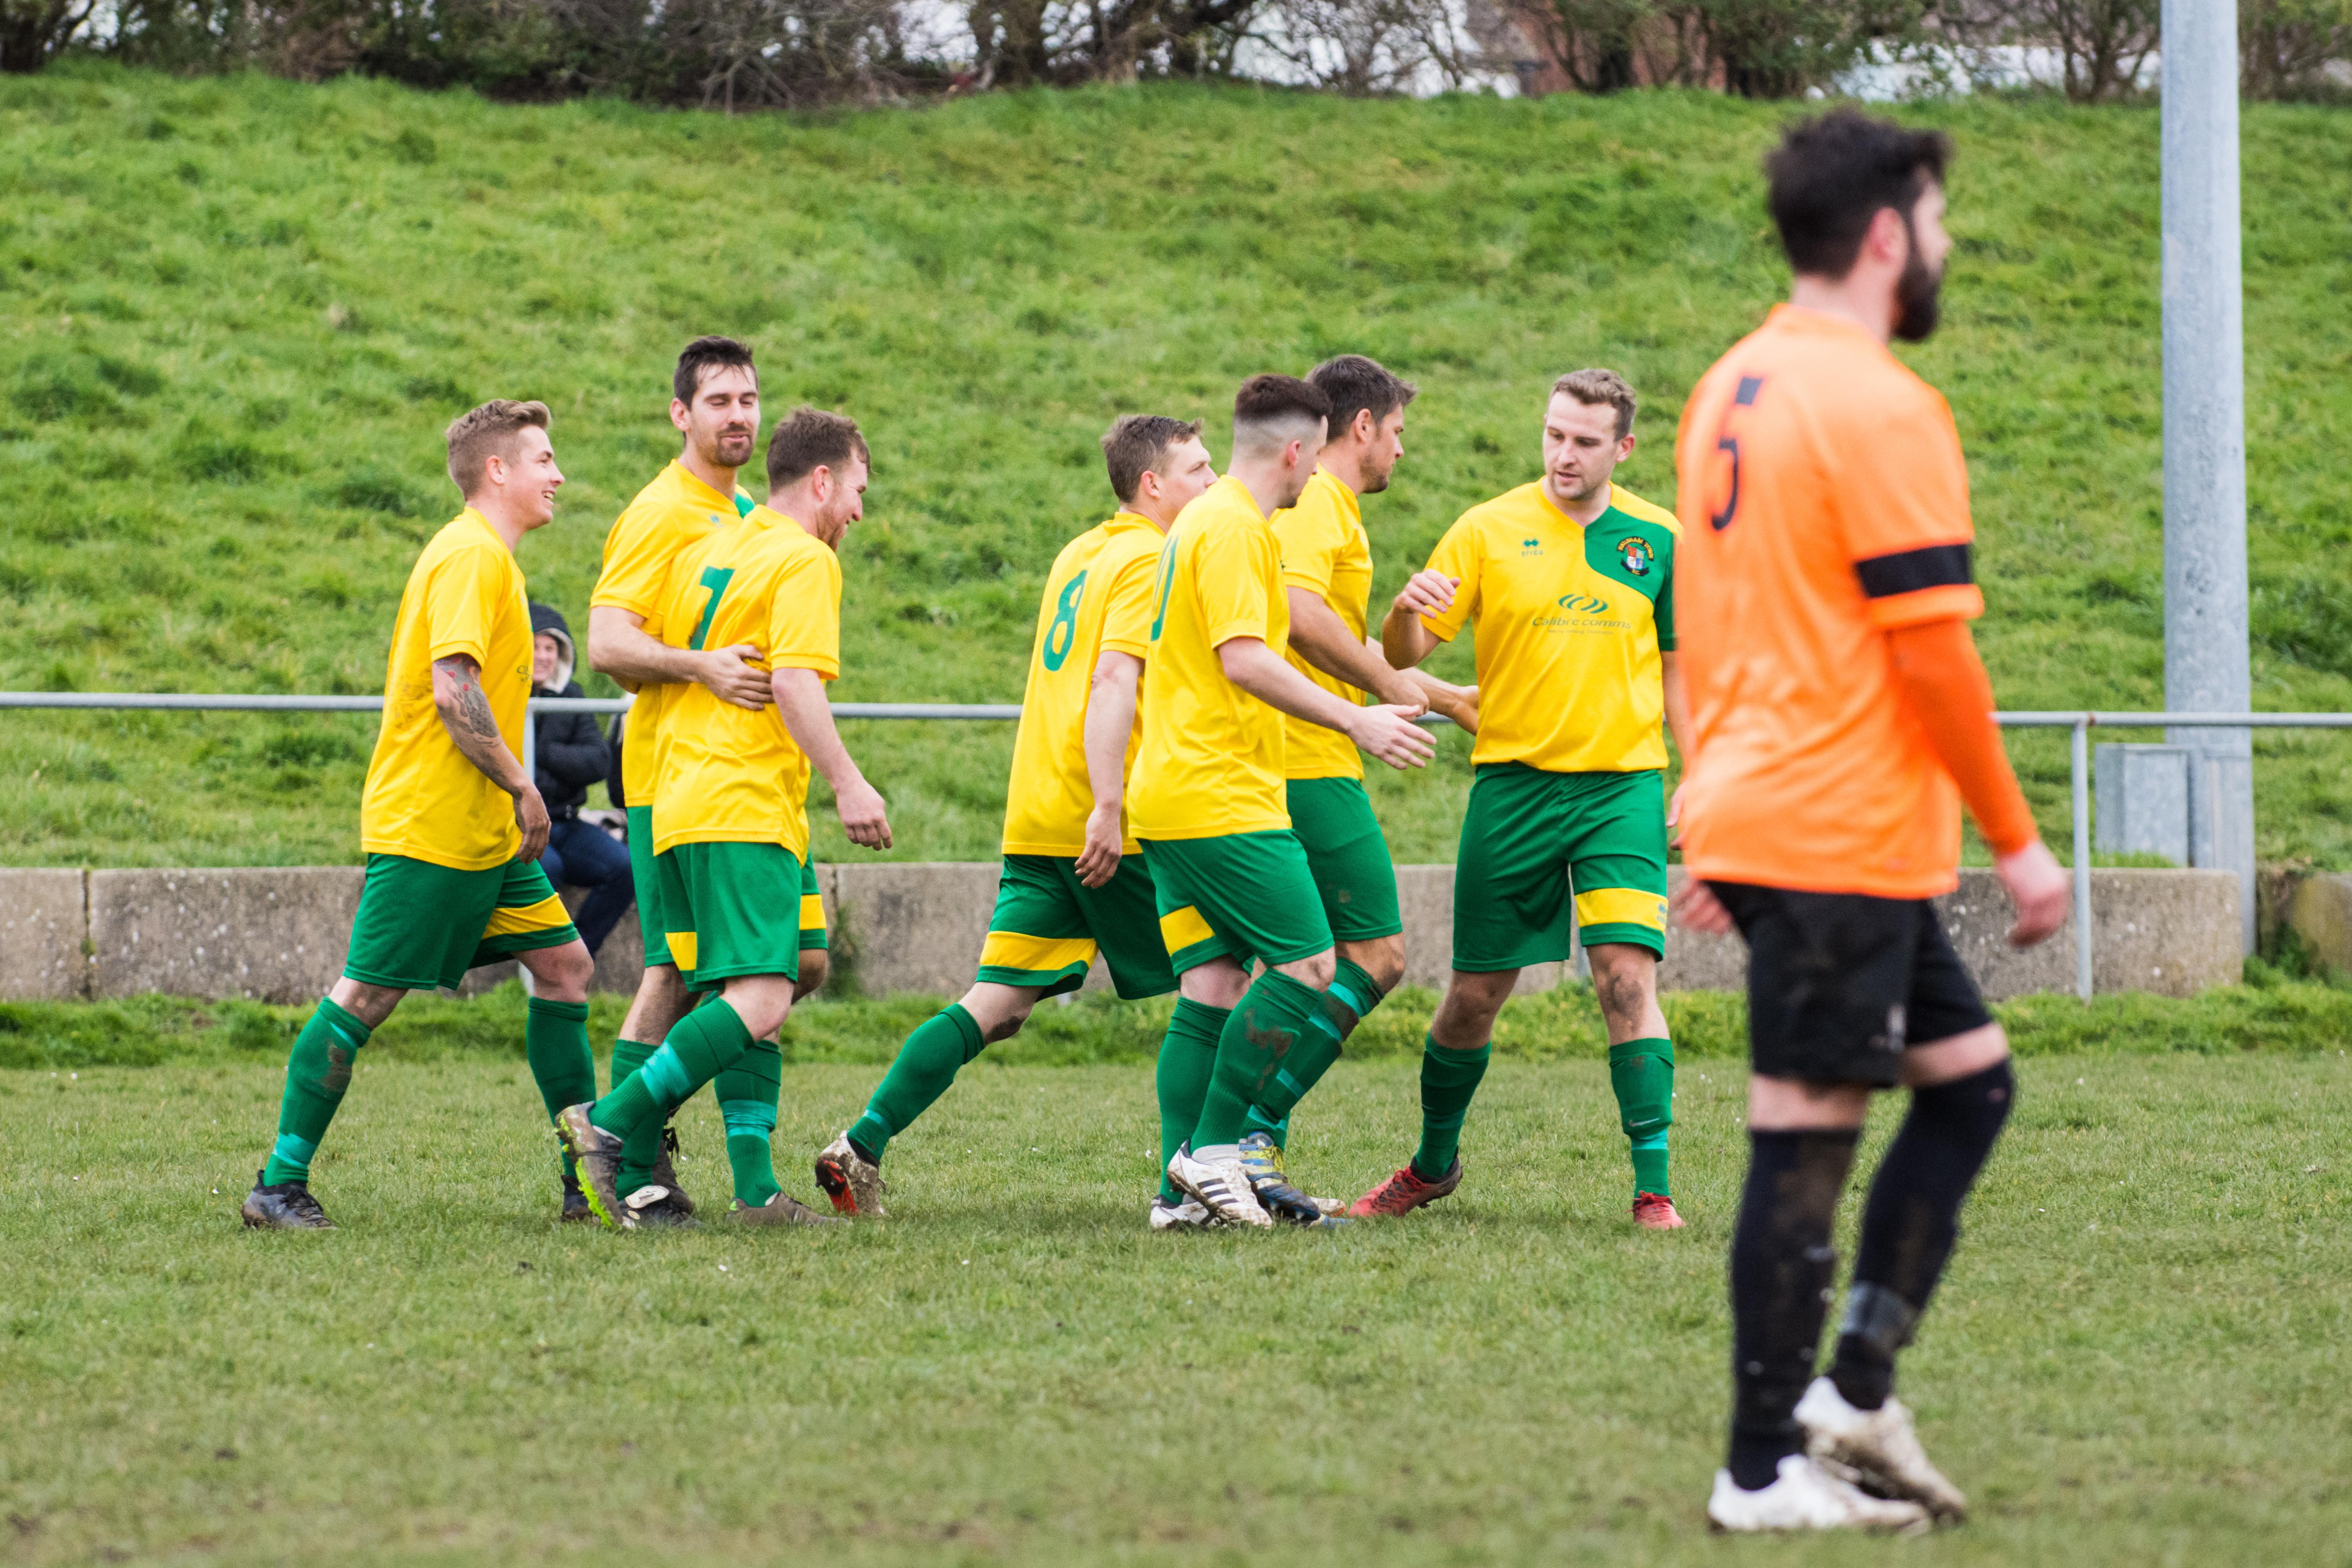 DAVID_JEFFERY Mile Oak FC vs Hailsham Town FC 24.03.18 62